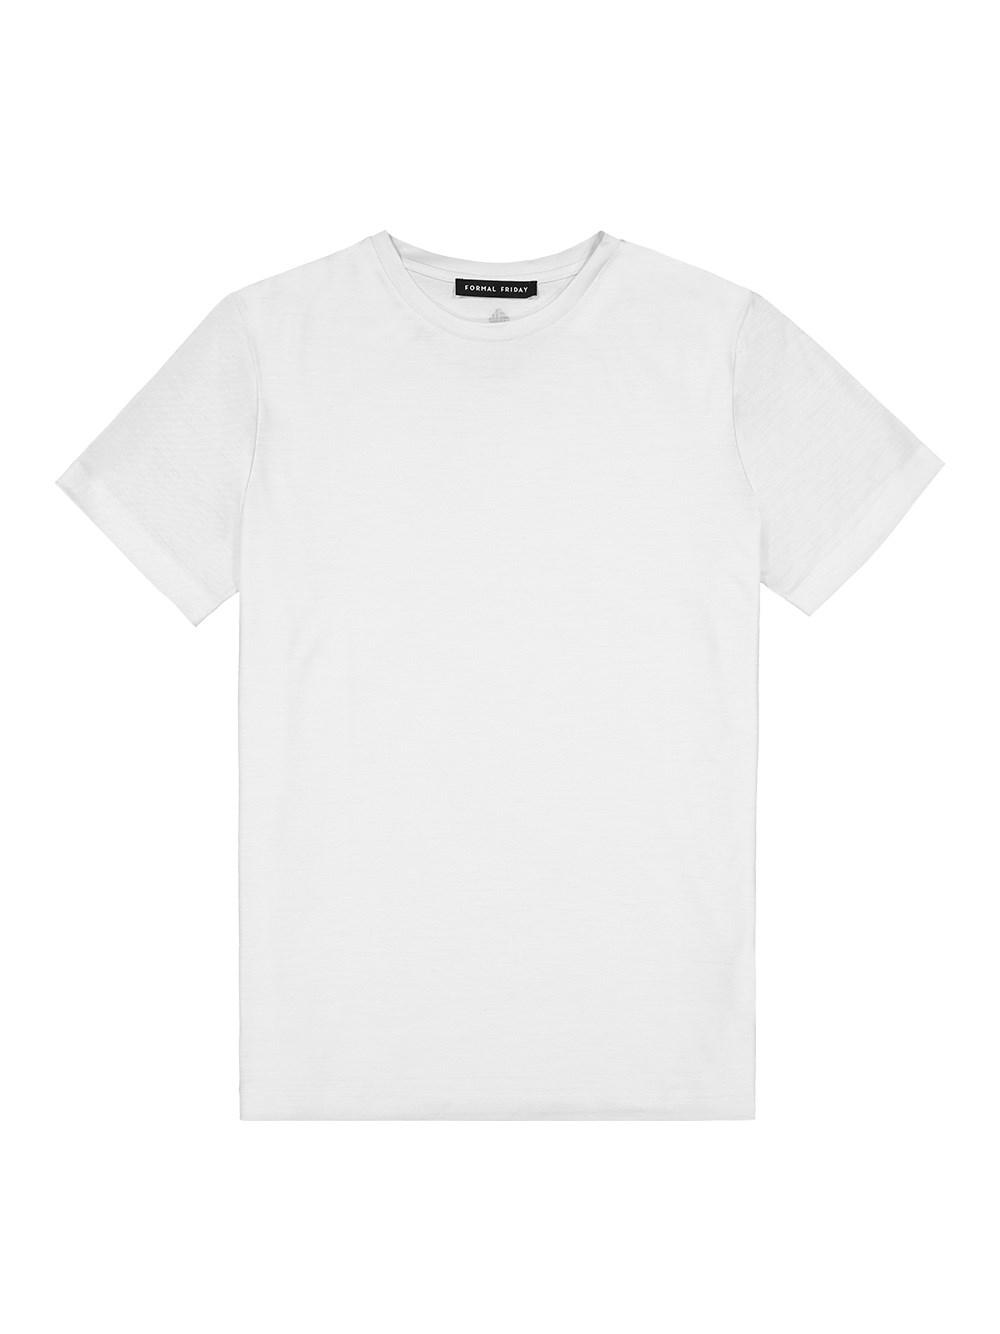 FORMAL FRIDAY White T-Shirt In Ultra-Fine Merino Wool